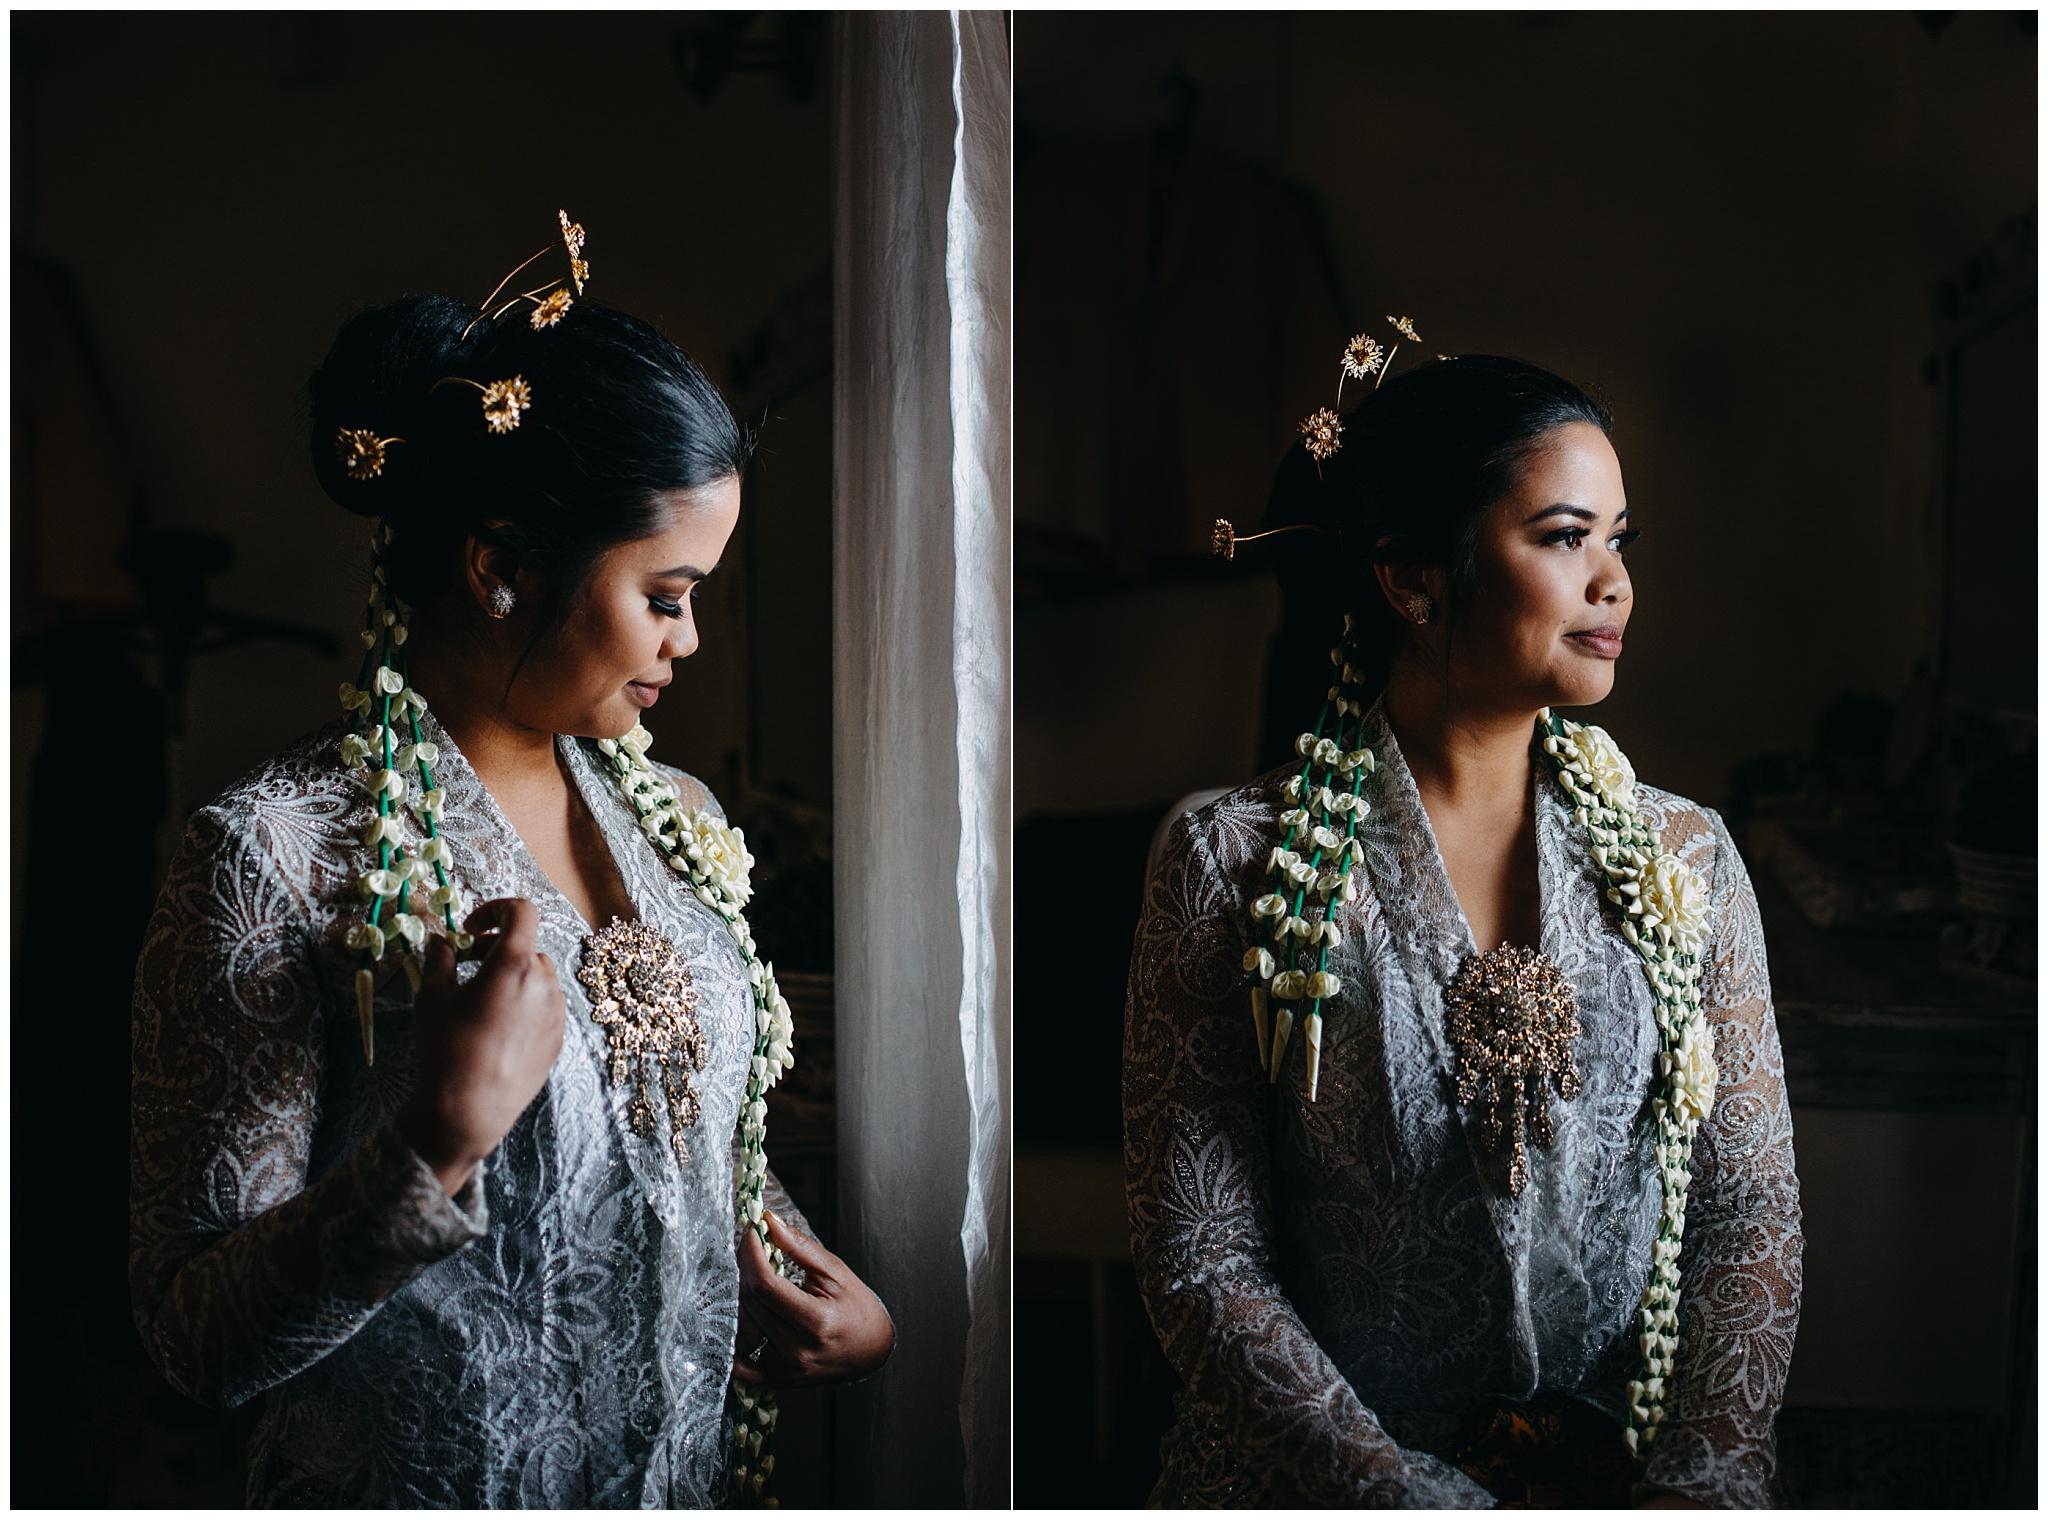 dramatic artistic bride portrait at fraser river lodge wedding